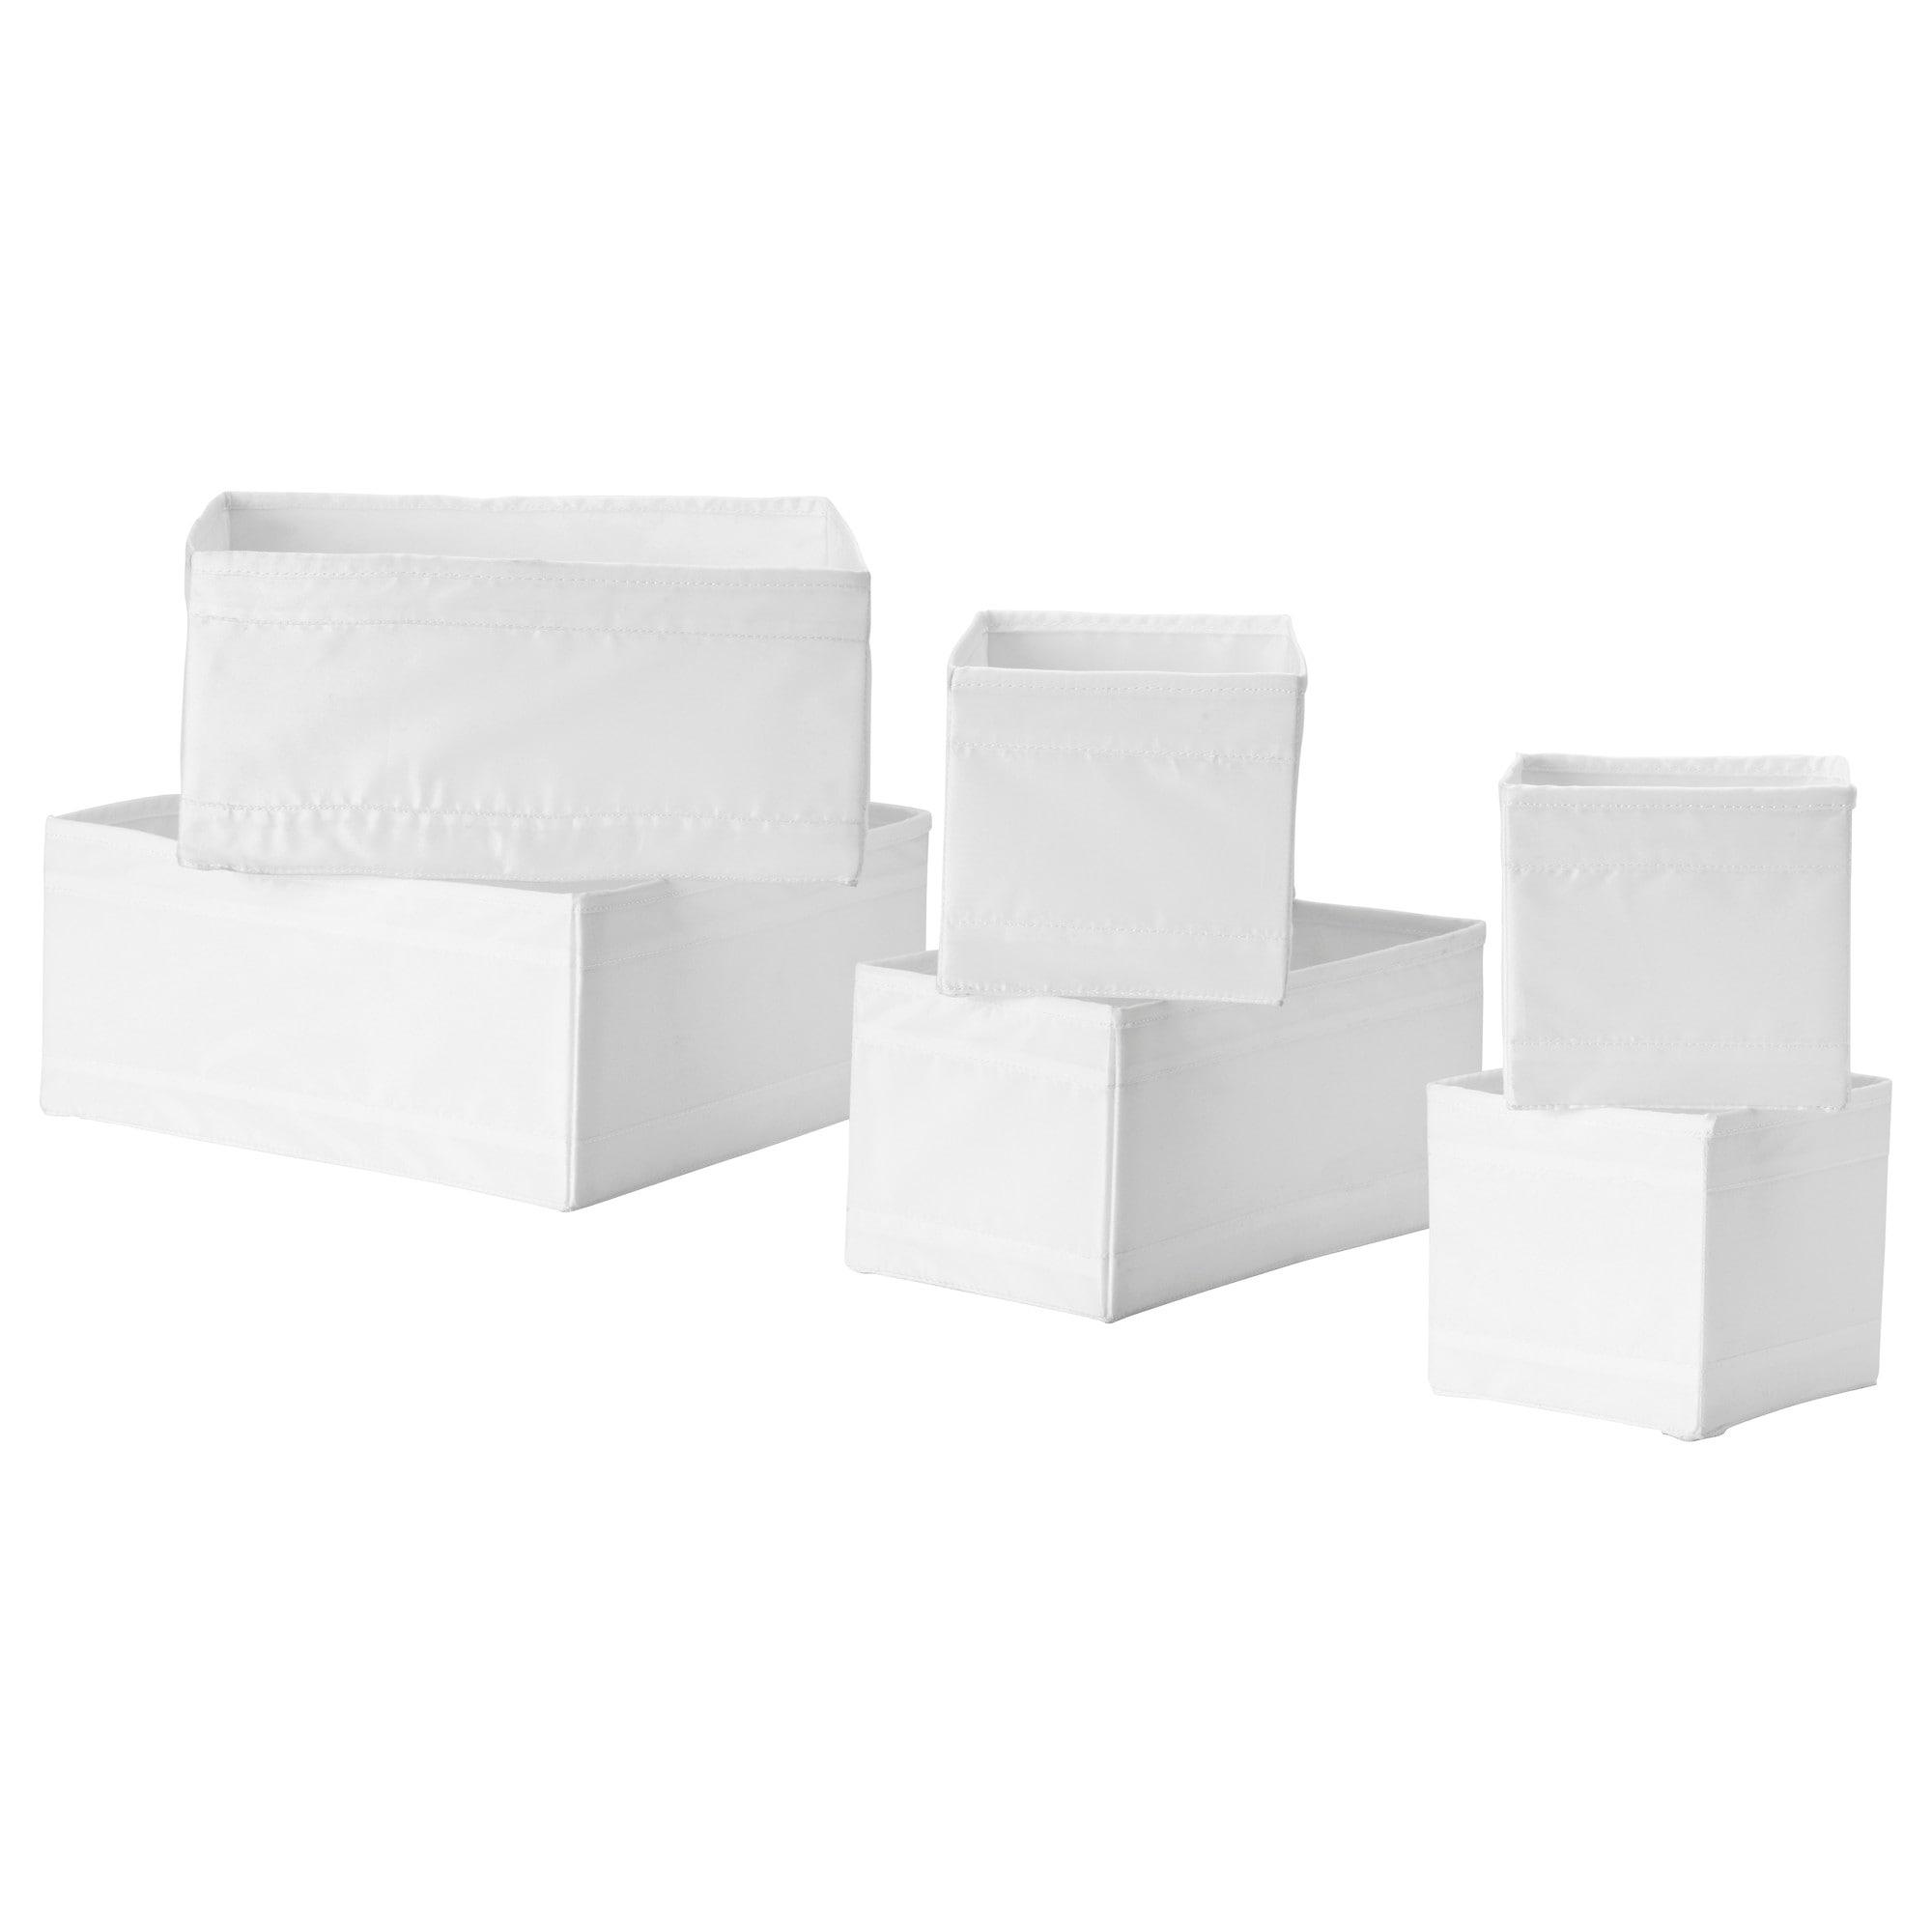 ikea-box-set-white.jpg